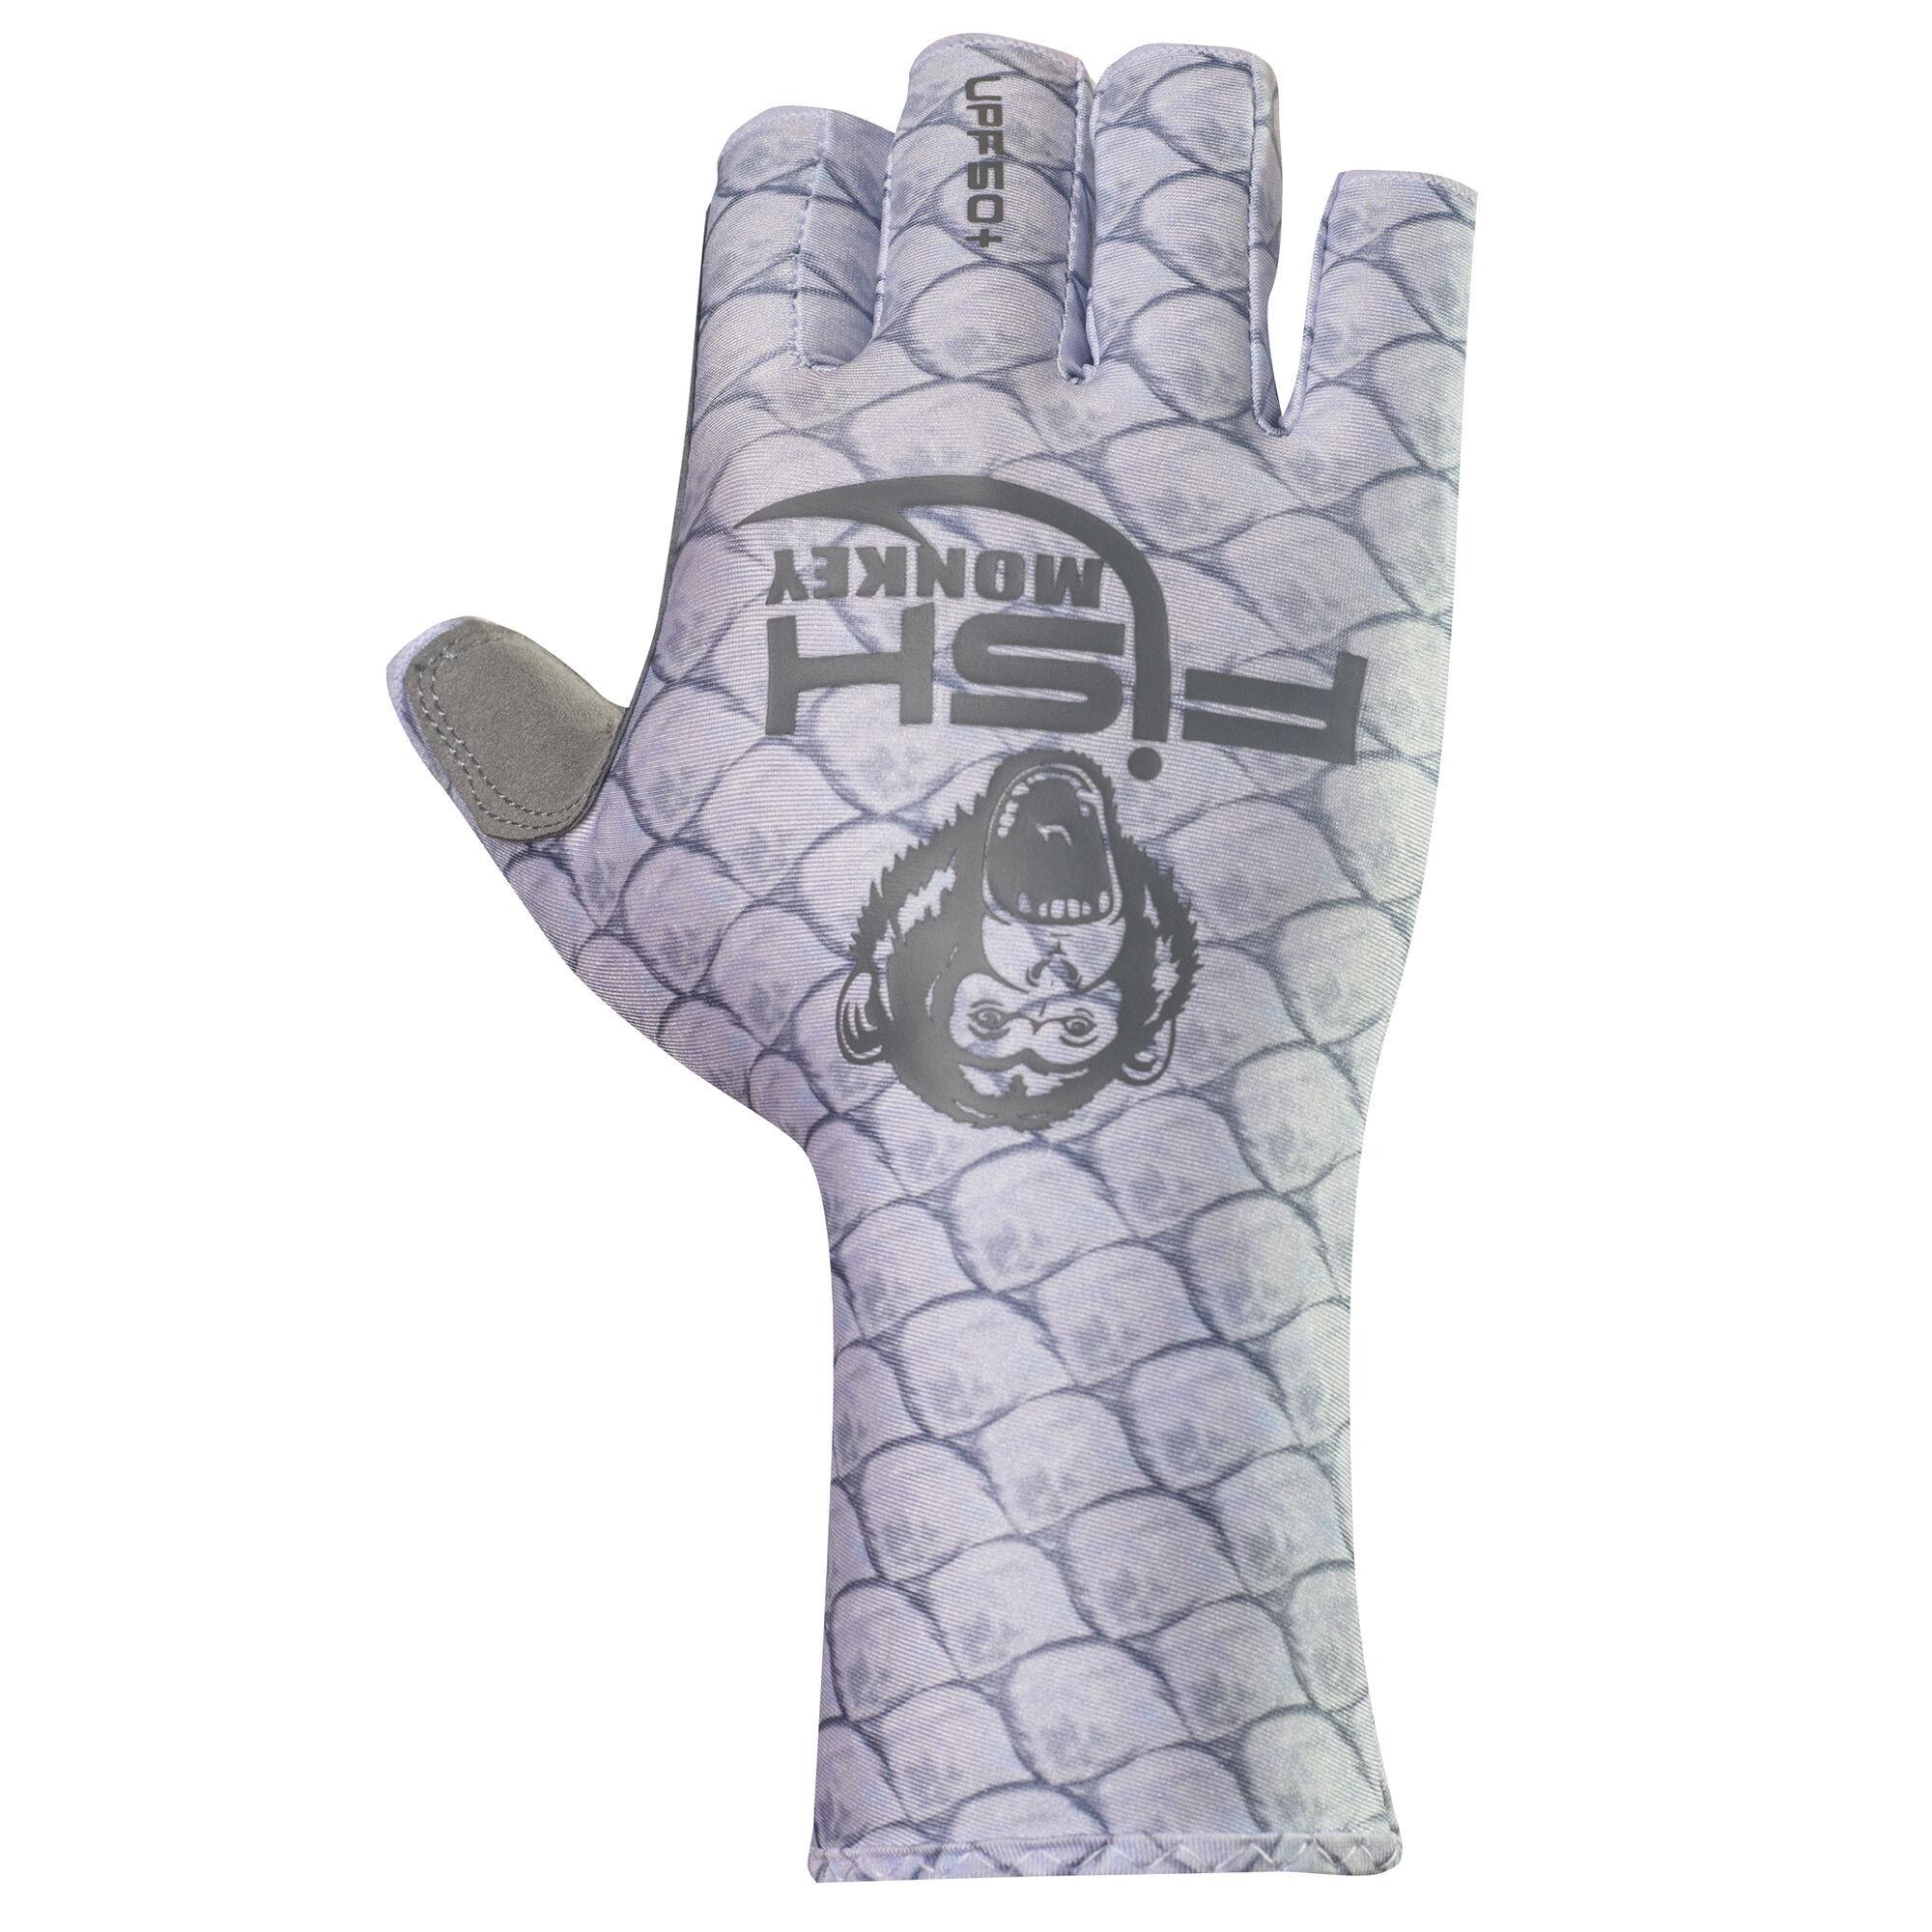 "Fish Monkey UPF 50 Sun Protection Half Finger Guide Glove Sports /"" Tarpon"